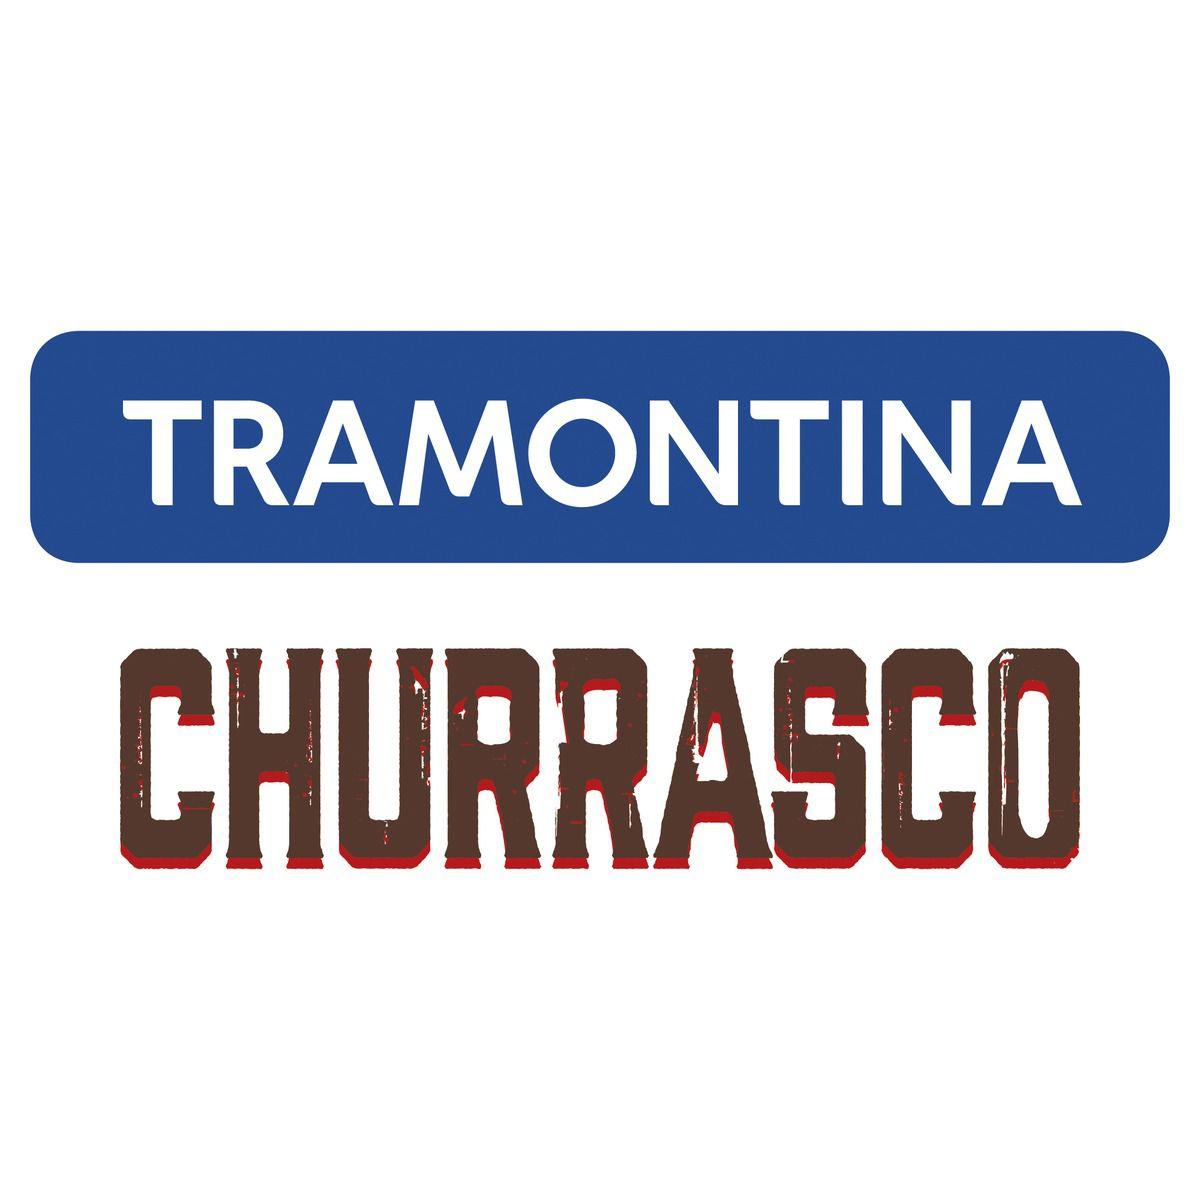 "Faca para churrasco jumbo 5"" 21116/095 | Lojas Estrela"